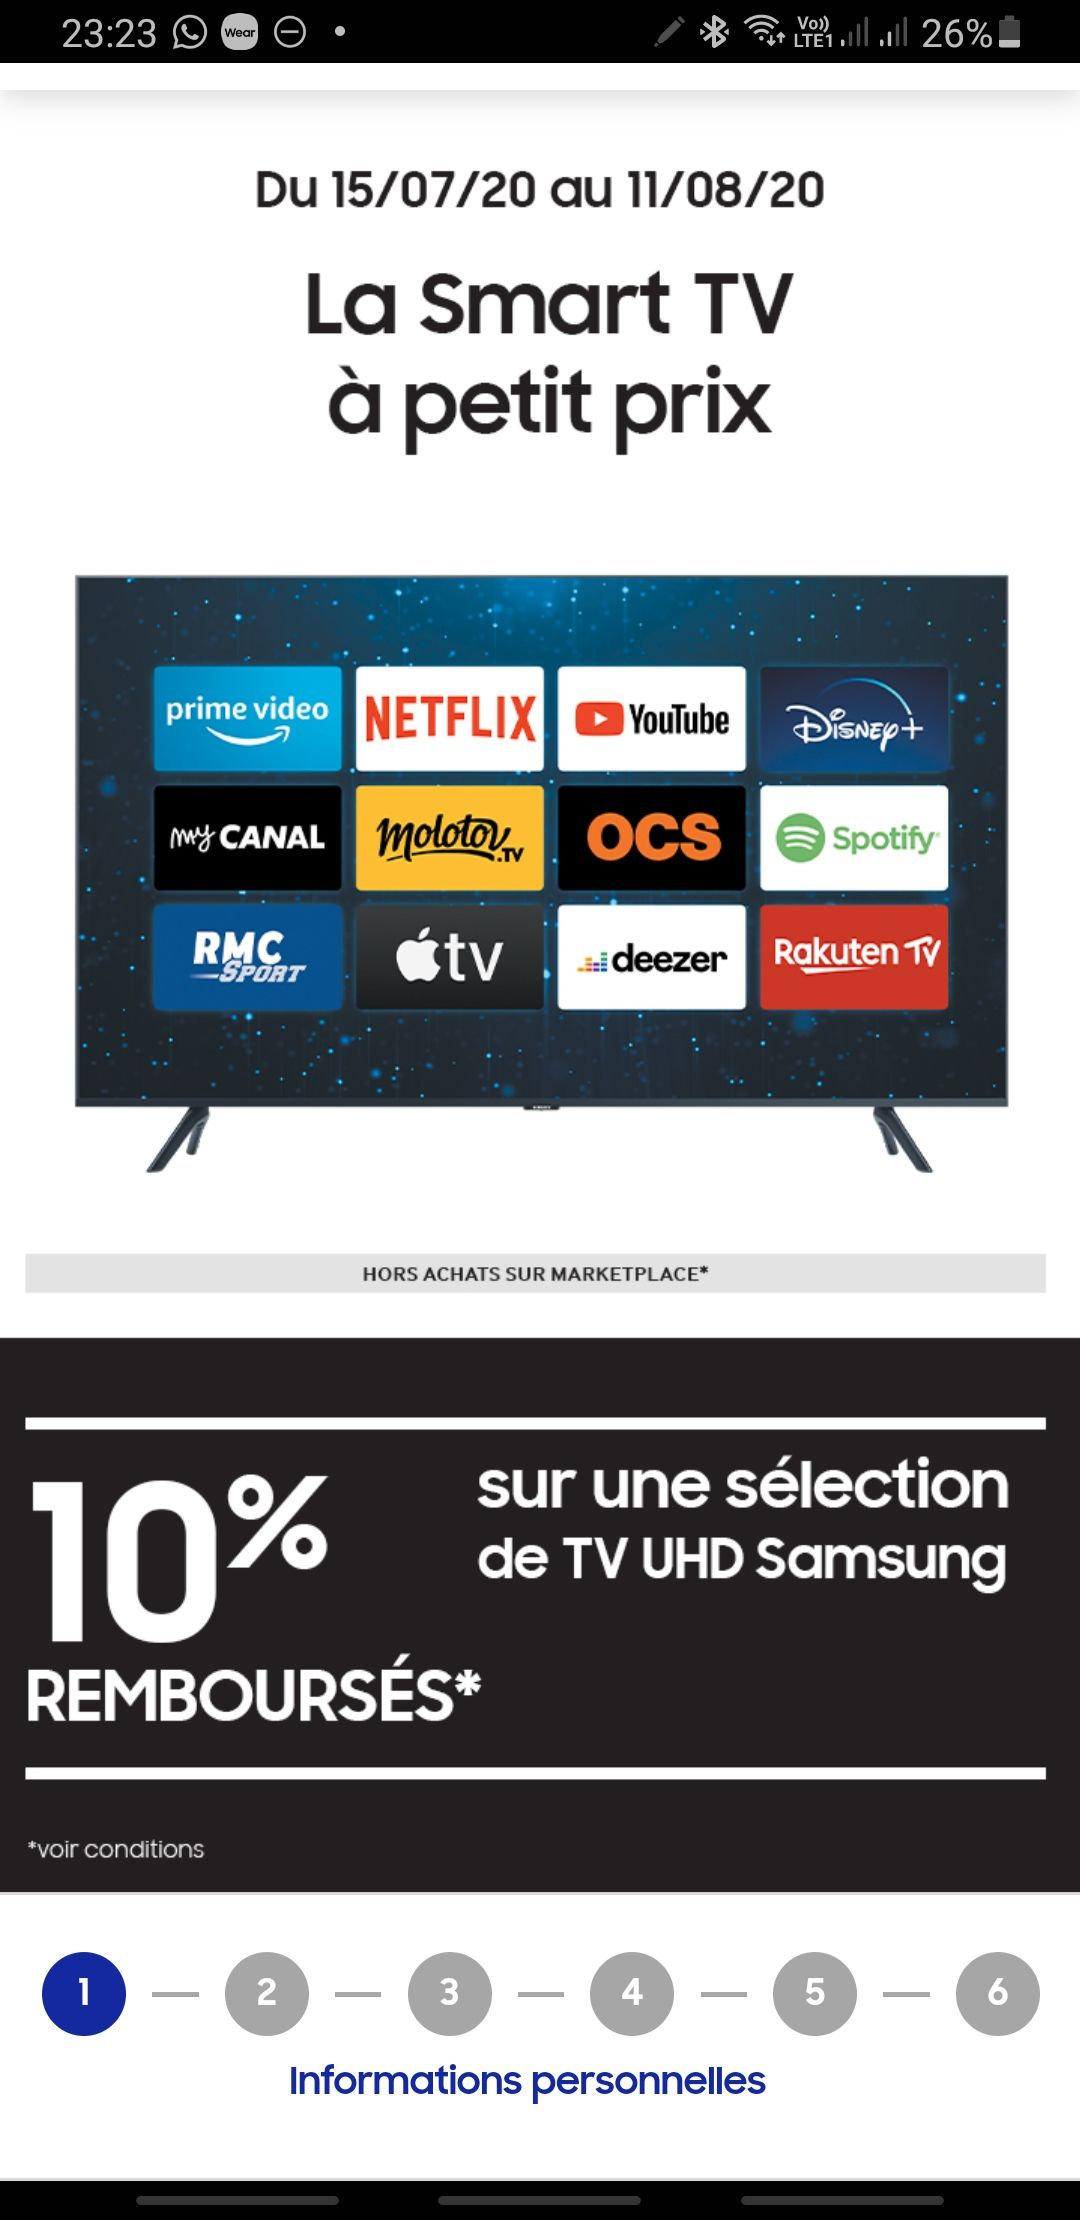 www samsung com fr offer smart tv a